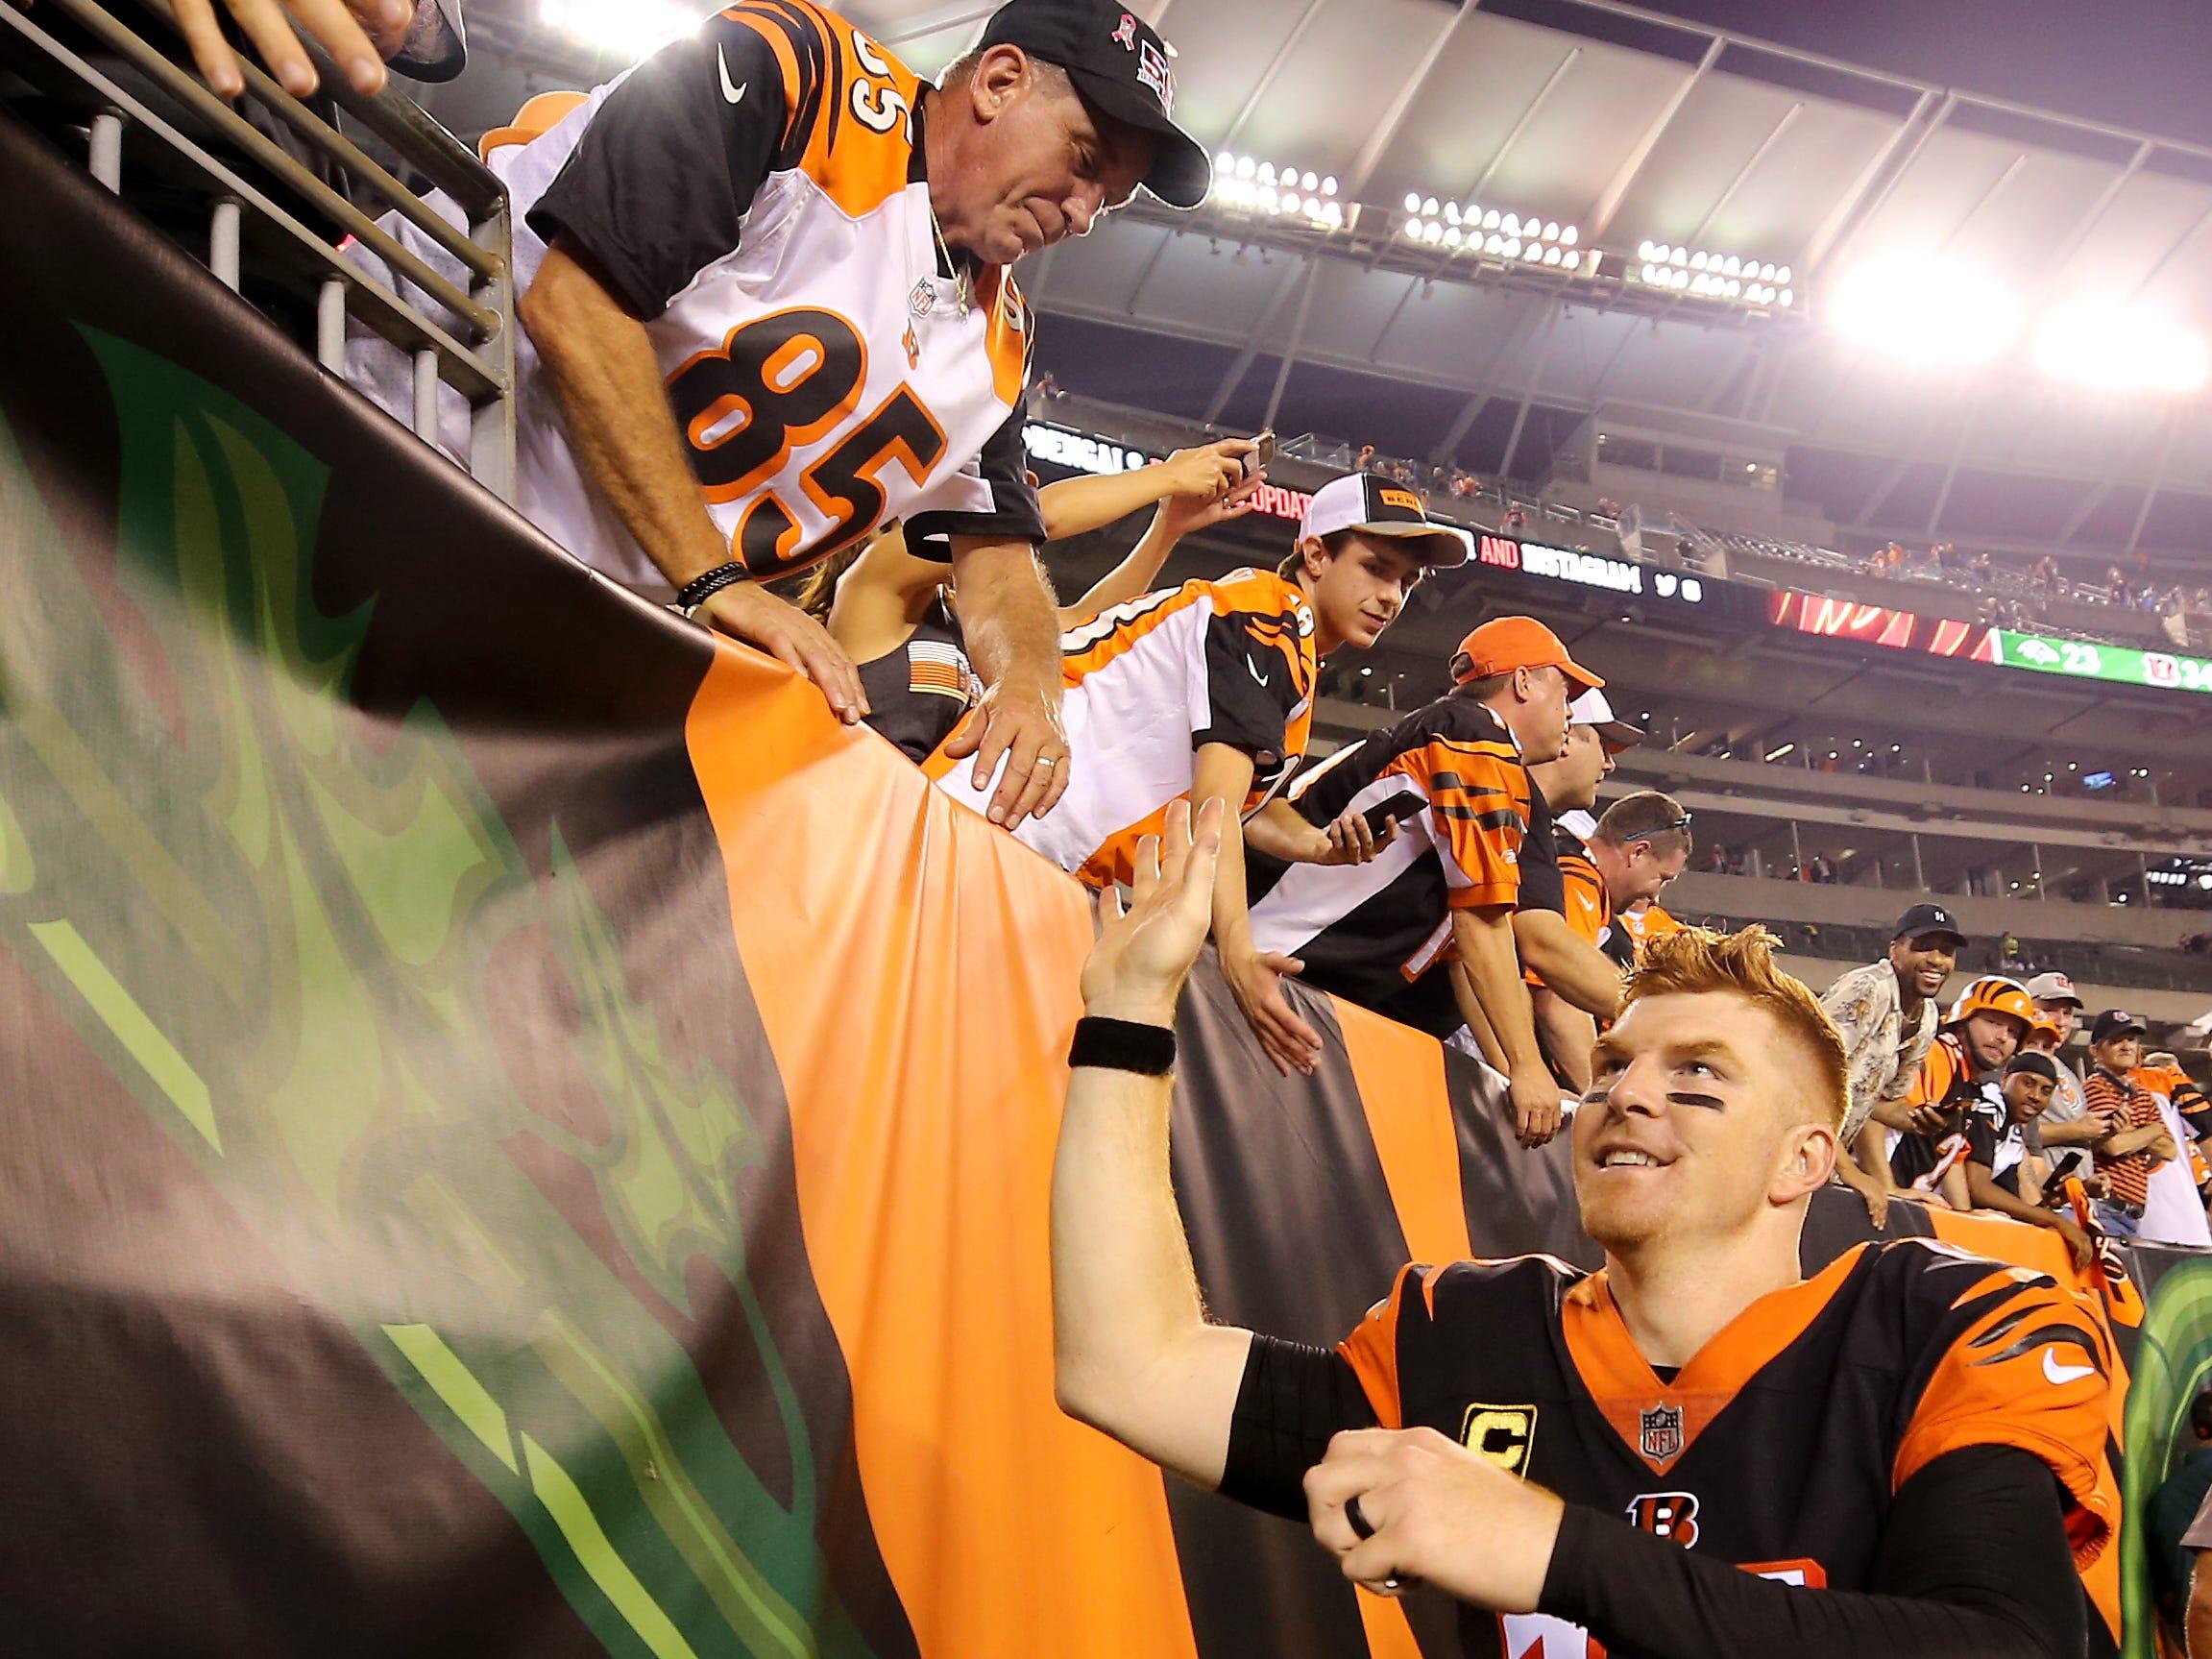 Cincinnati Bengals quarterback Andy Dalton (14) high fives fans after the Week 2 NFL football game between the Baltimore Ravens and the Cincinnati Bengals, Friday, Sept. 14, 2018, Paul Brown Stadium in Cincinnati. Cincinnati won 34-23.